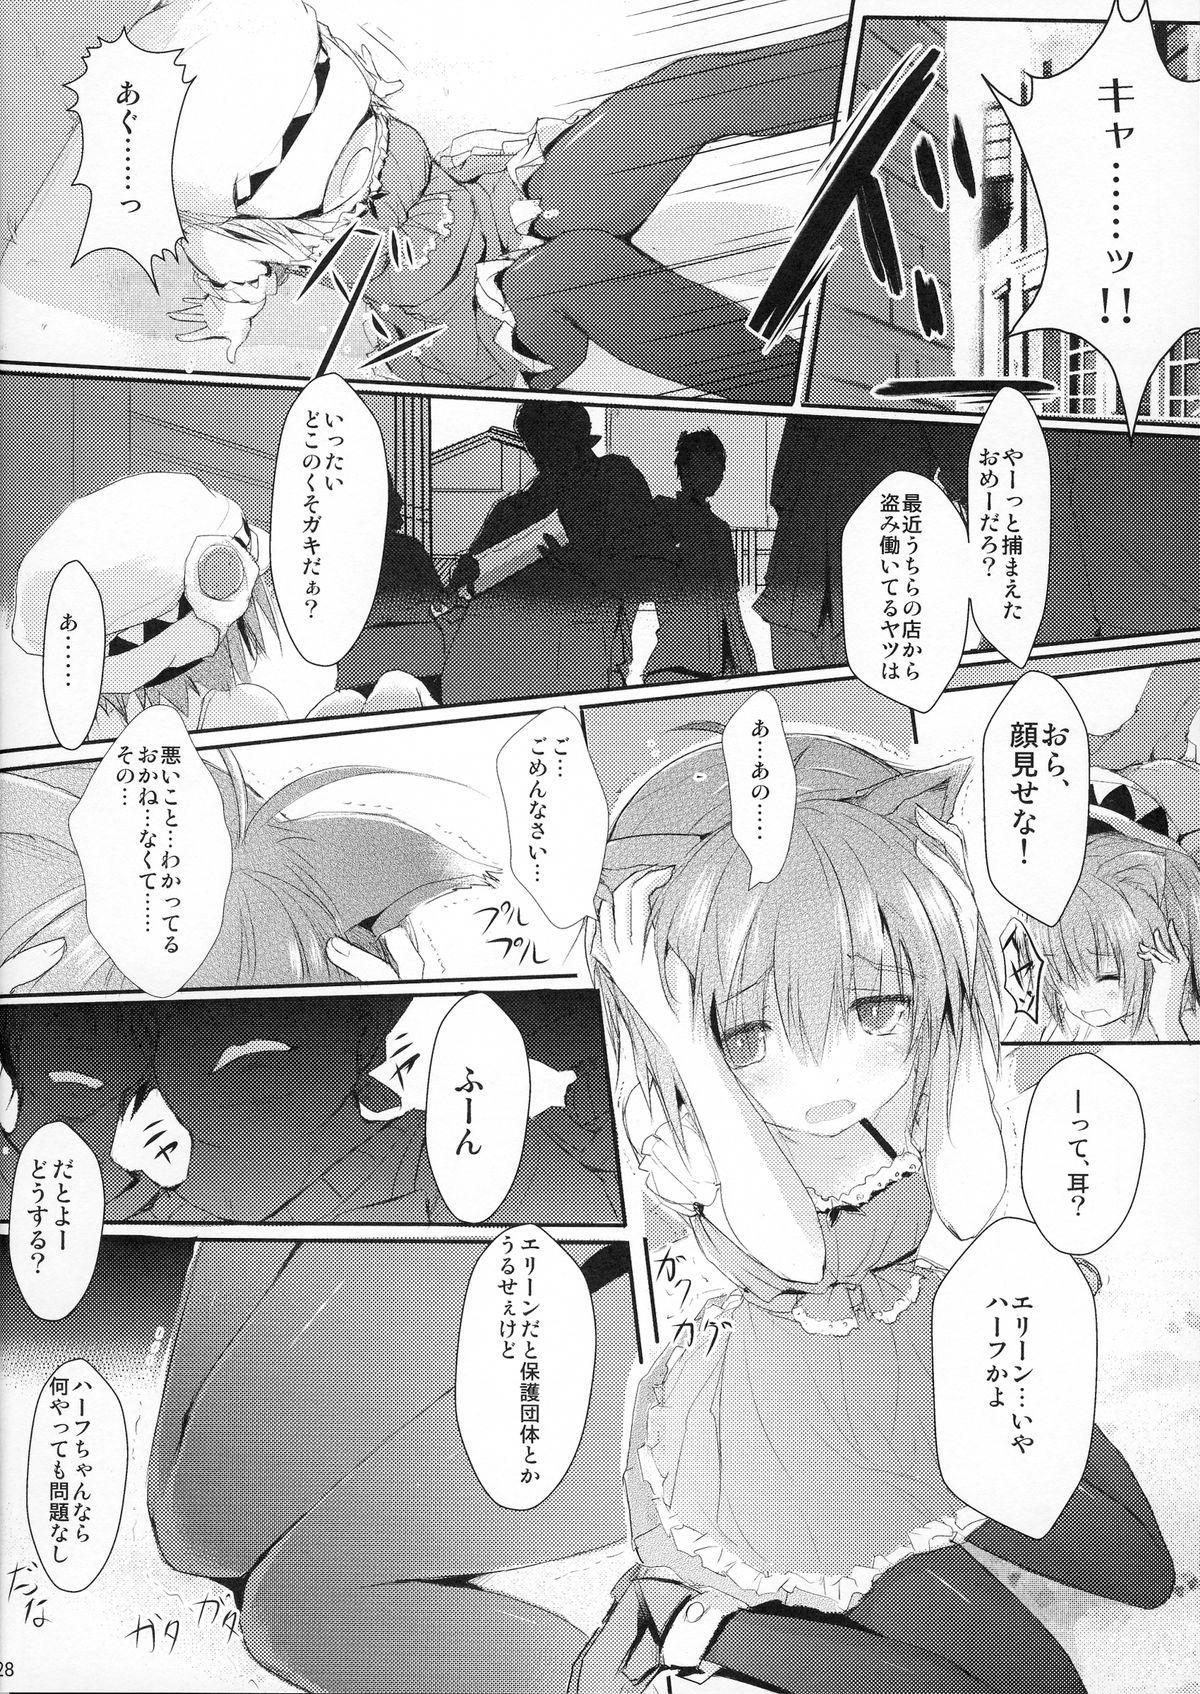 [Mirukomi (PRIMIL)] Human wa Erin-chan ni Hidoi Koto Shitai yo ne - ELIN's the best - (TERA The Exiled Realm of Arborea) 27